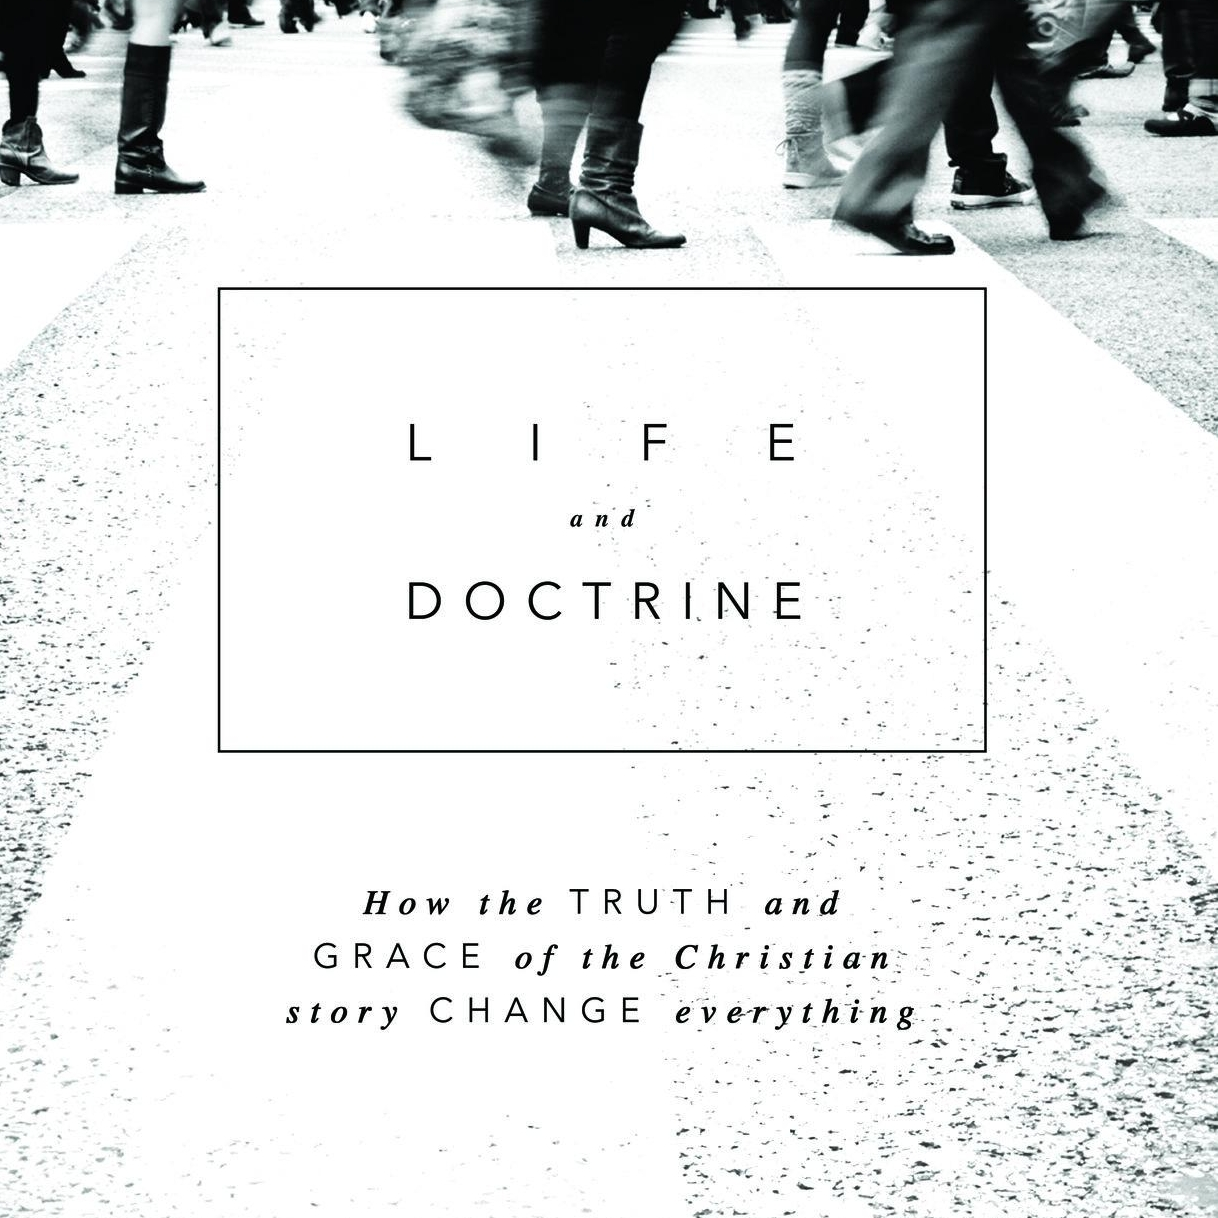 Life and Doctrine_3.jpg